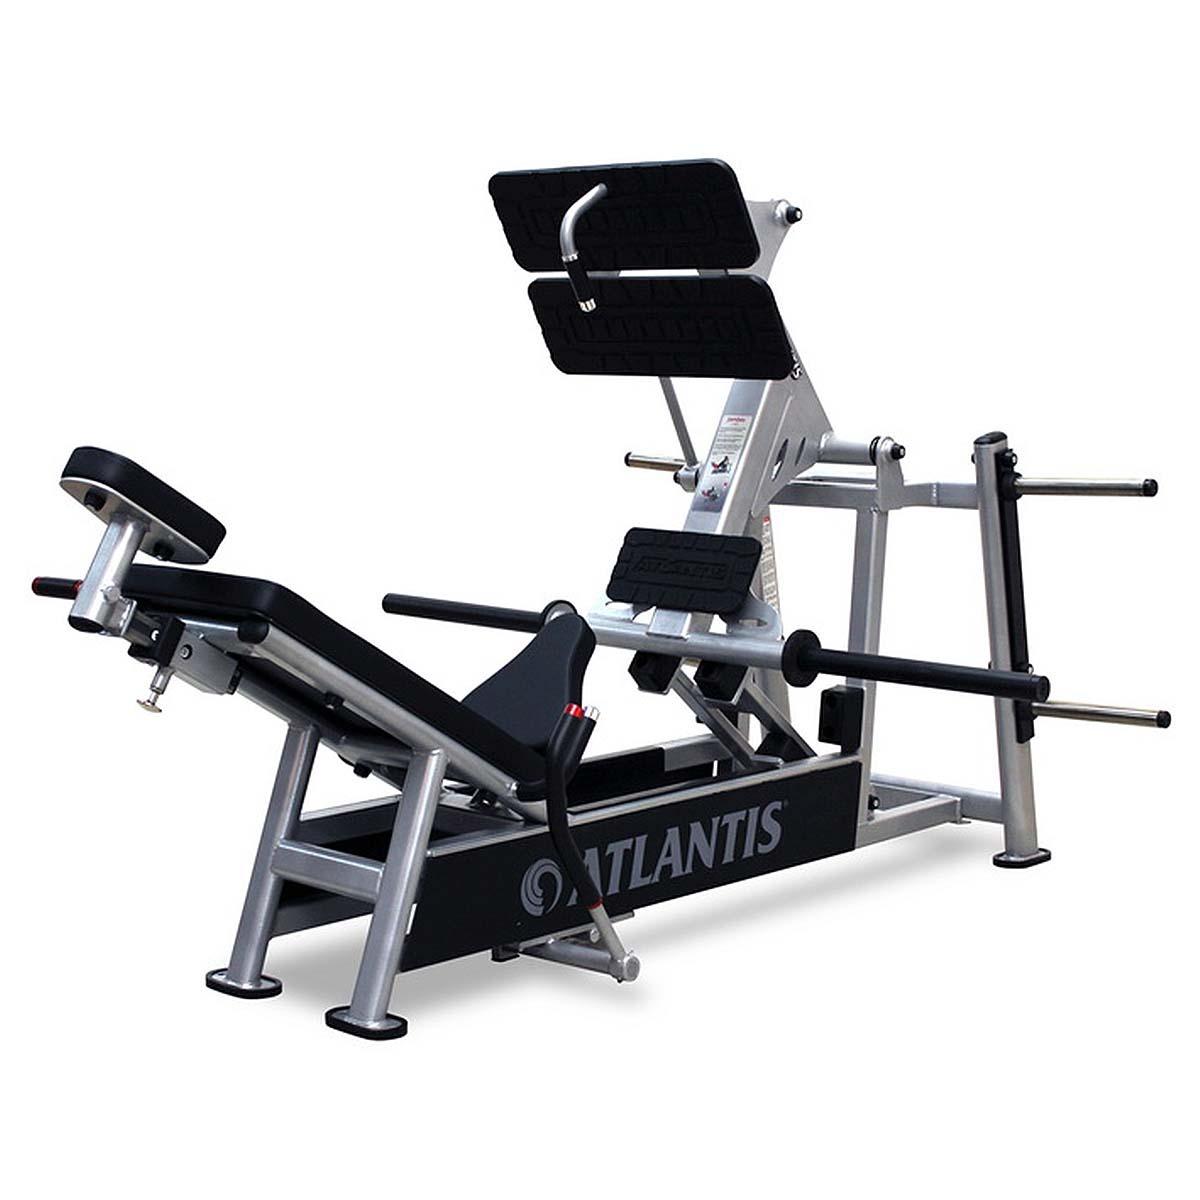 Richmond Strength Equipment - Atlantis Precision Series - Lifestyle Equipment